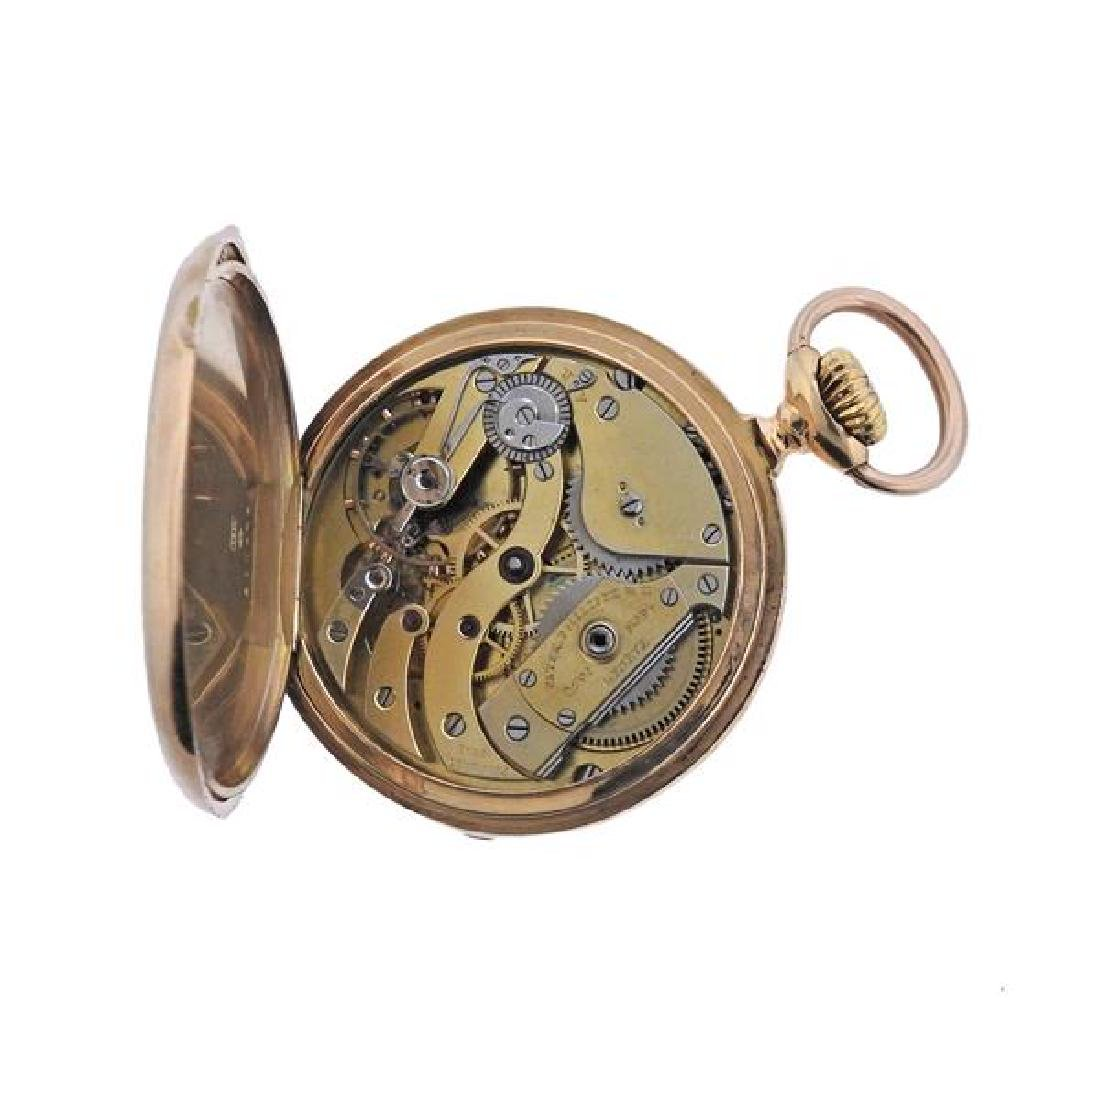 Patek Philippe 18k Gold Pocket Watch - 6